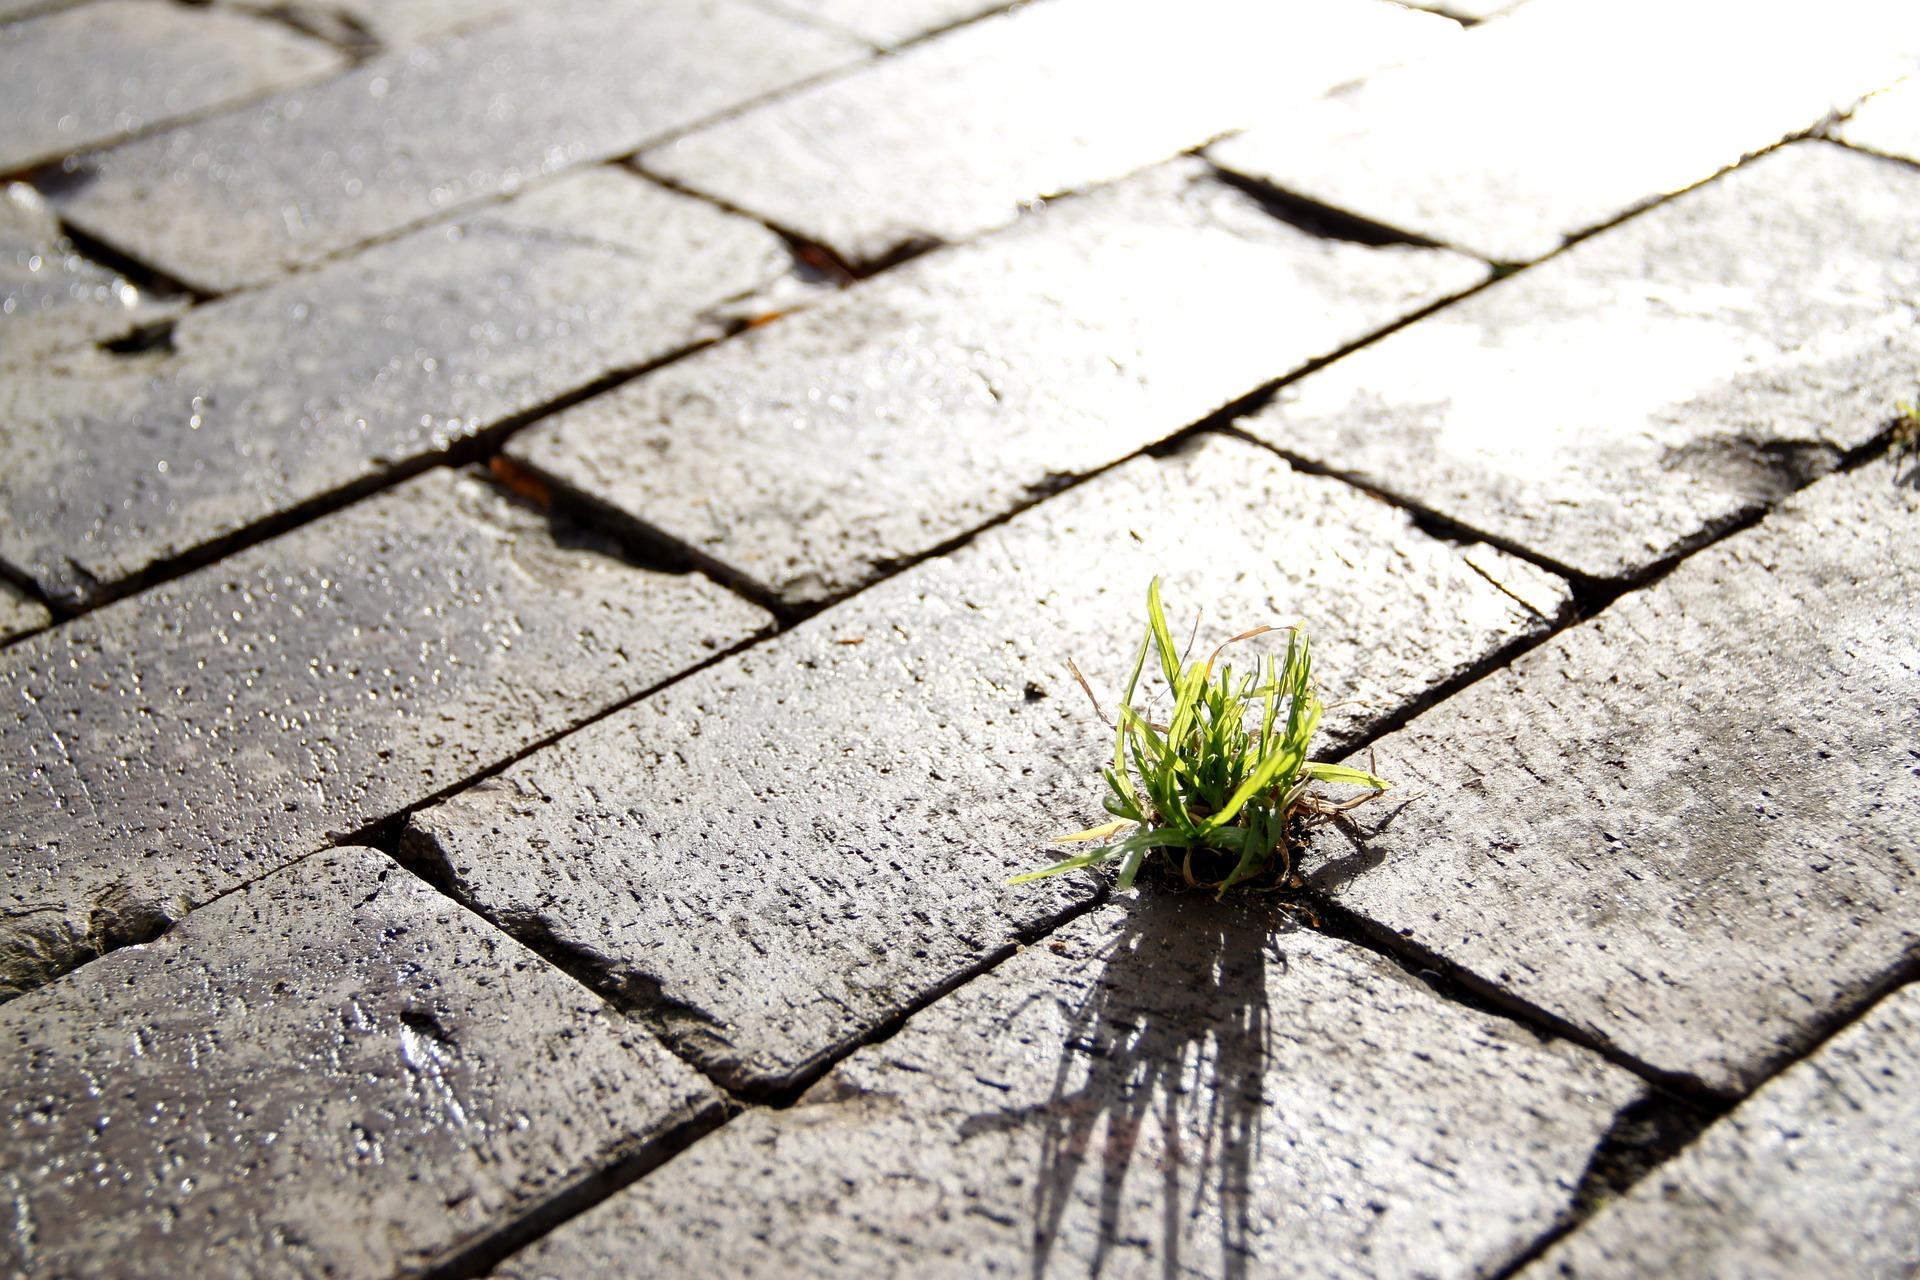 groen plukje gras in de straat